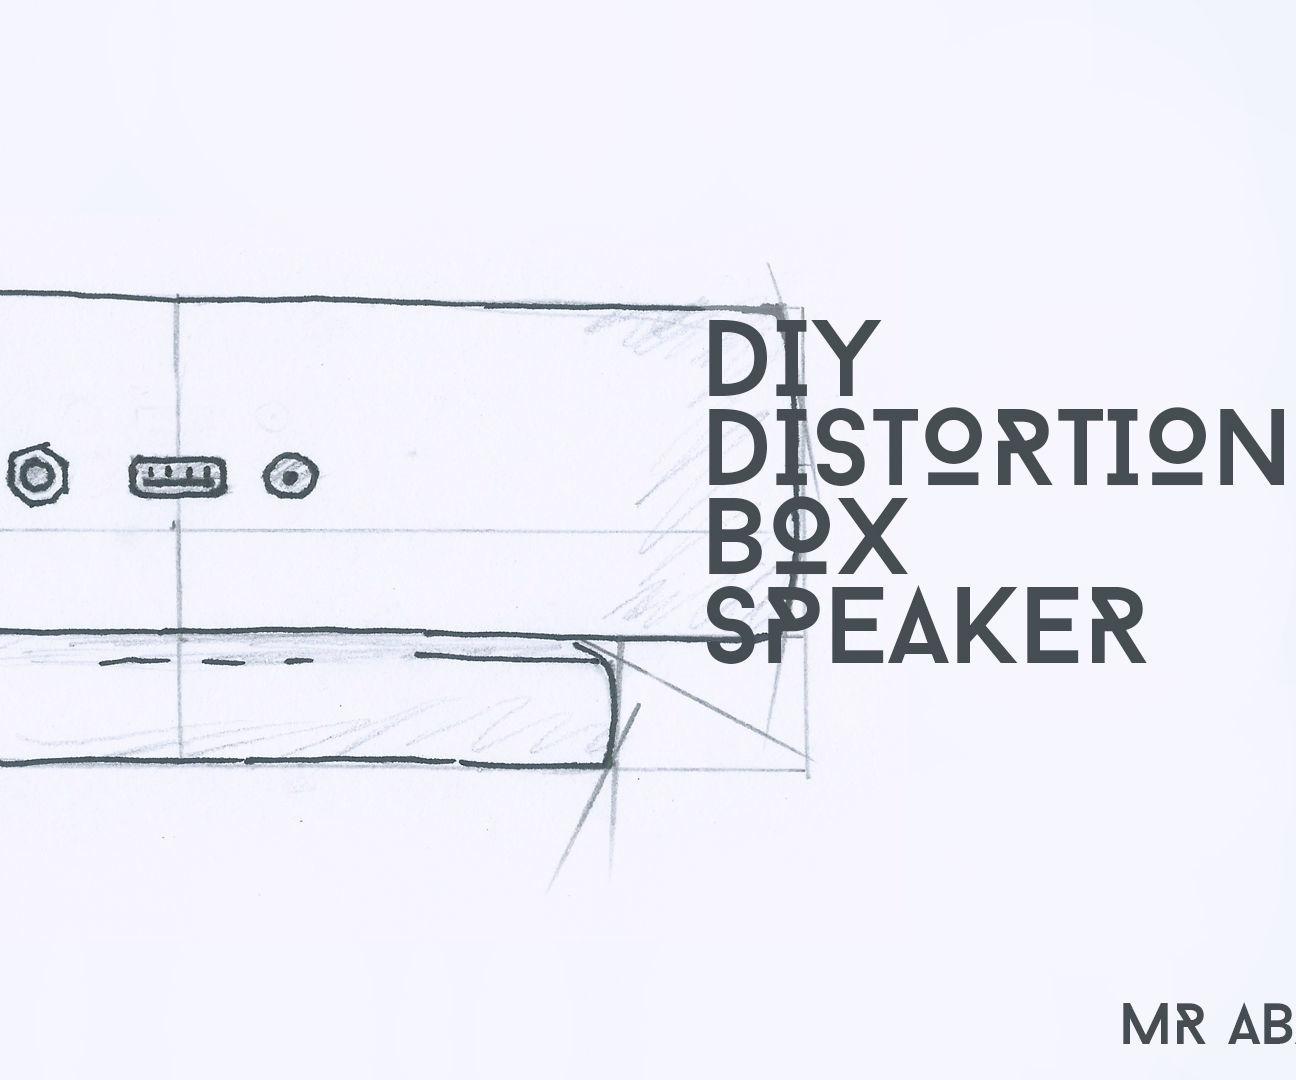 Make your own Distortion Box Speaker!